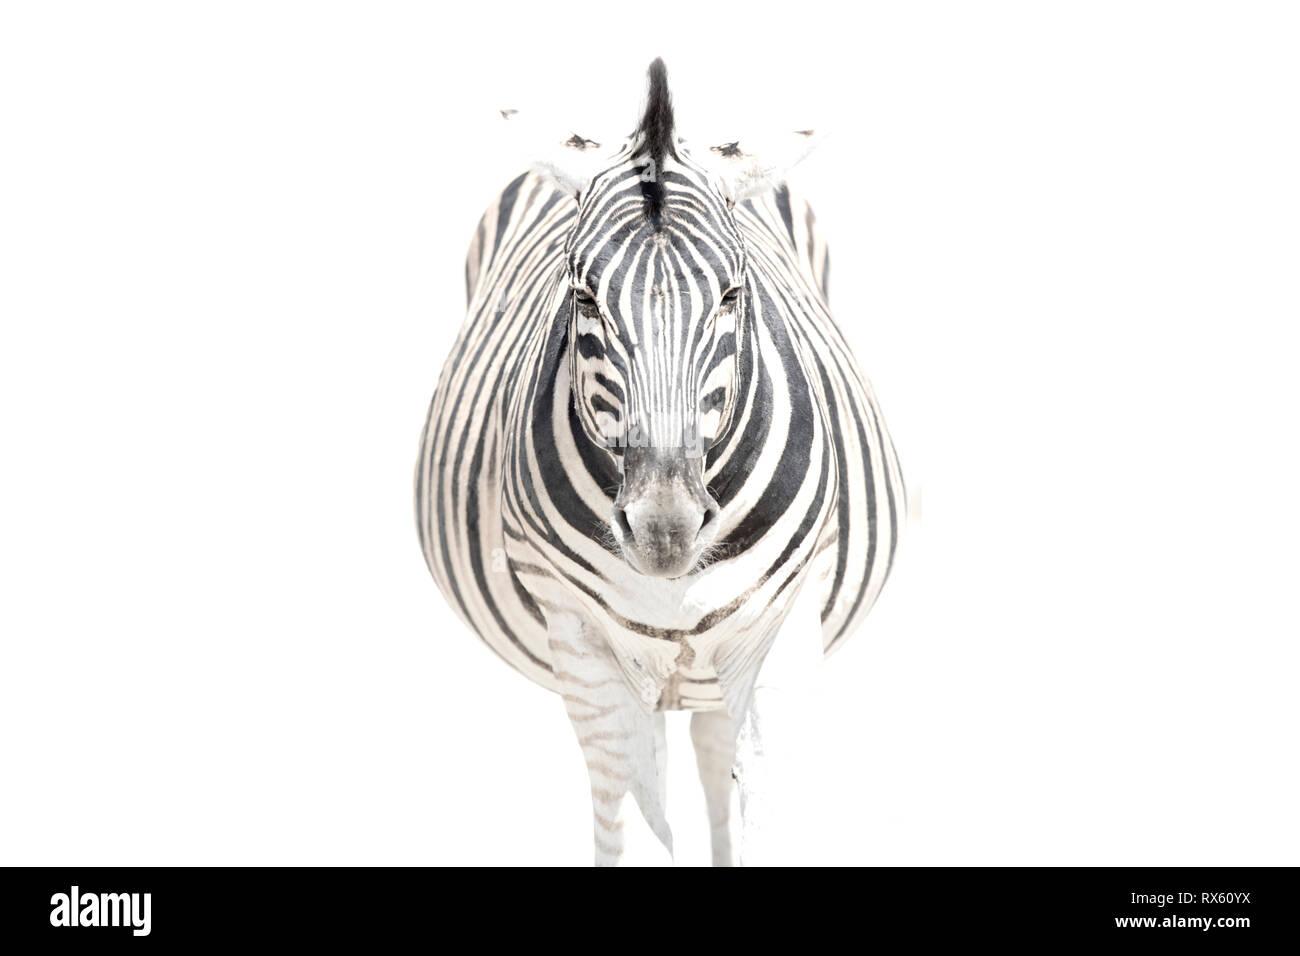 A High Key image of a Zebra - Stock Image